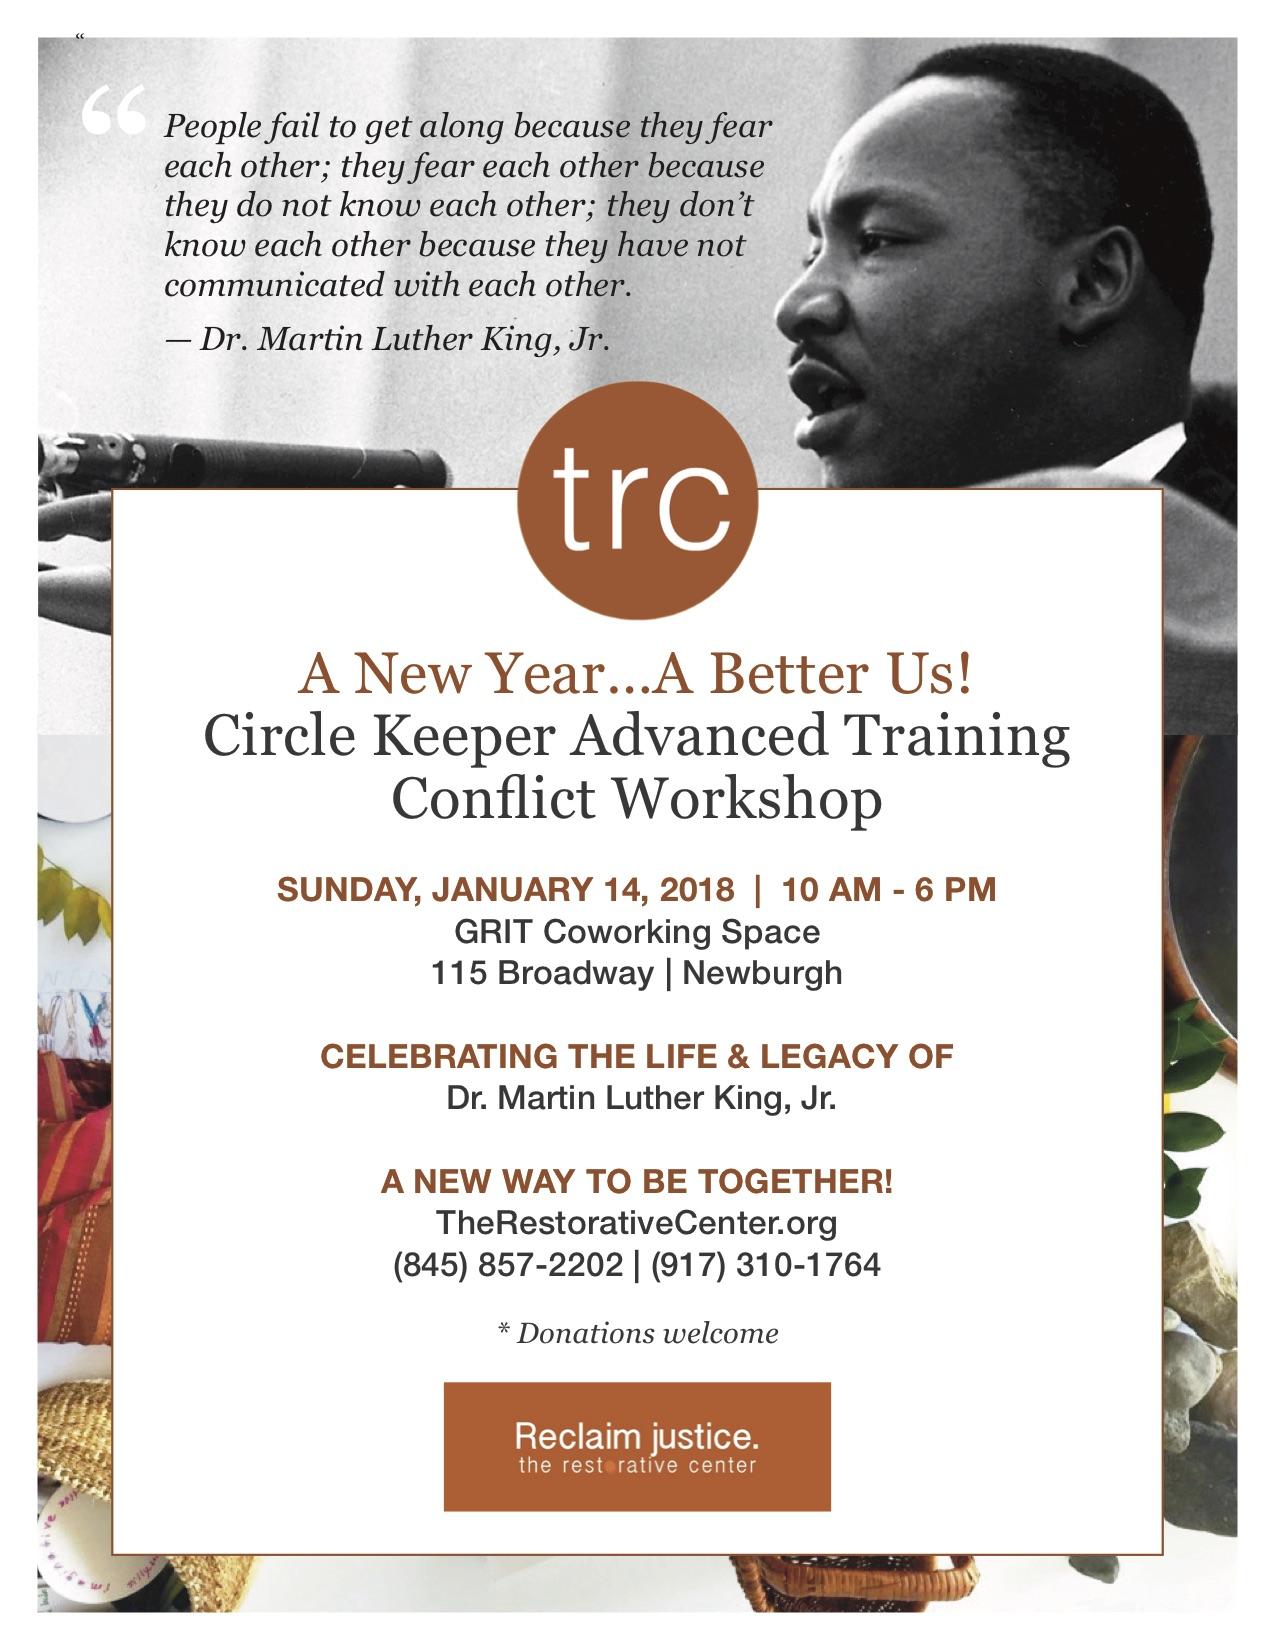 TRC_MLK_Conflict_Training_11417_final.jpg